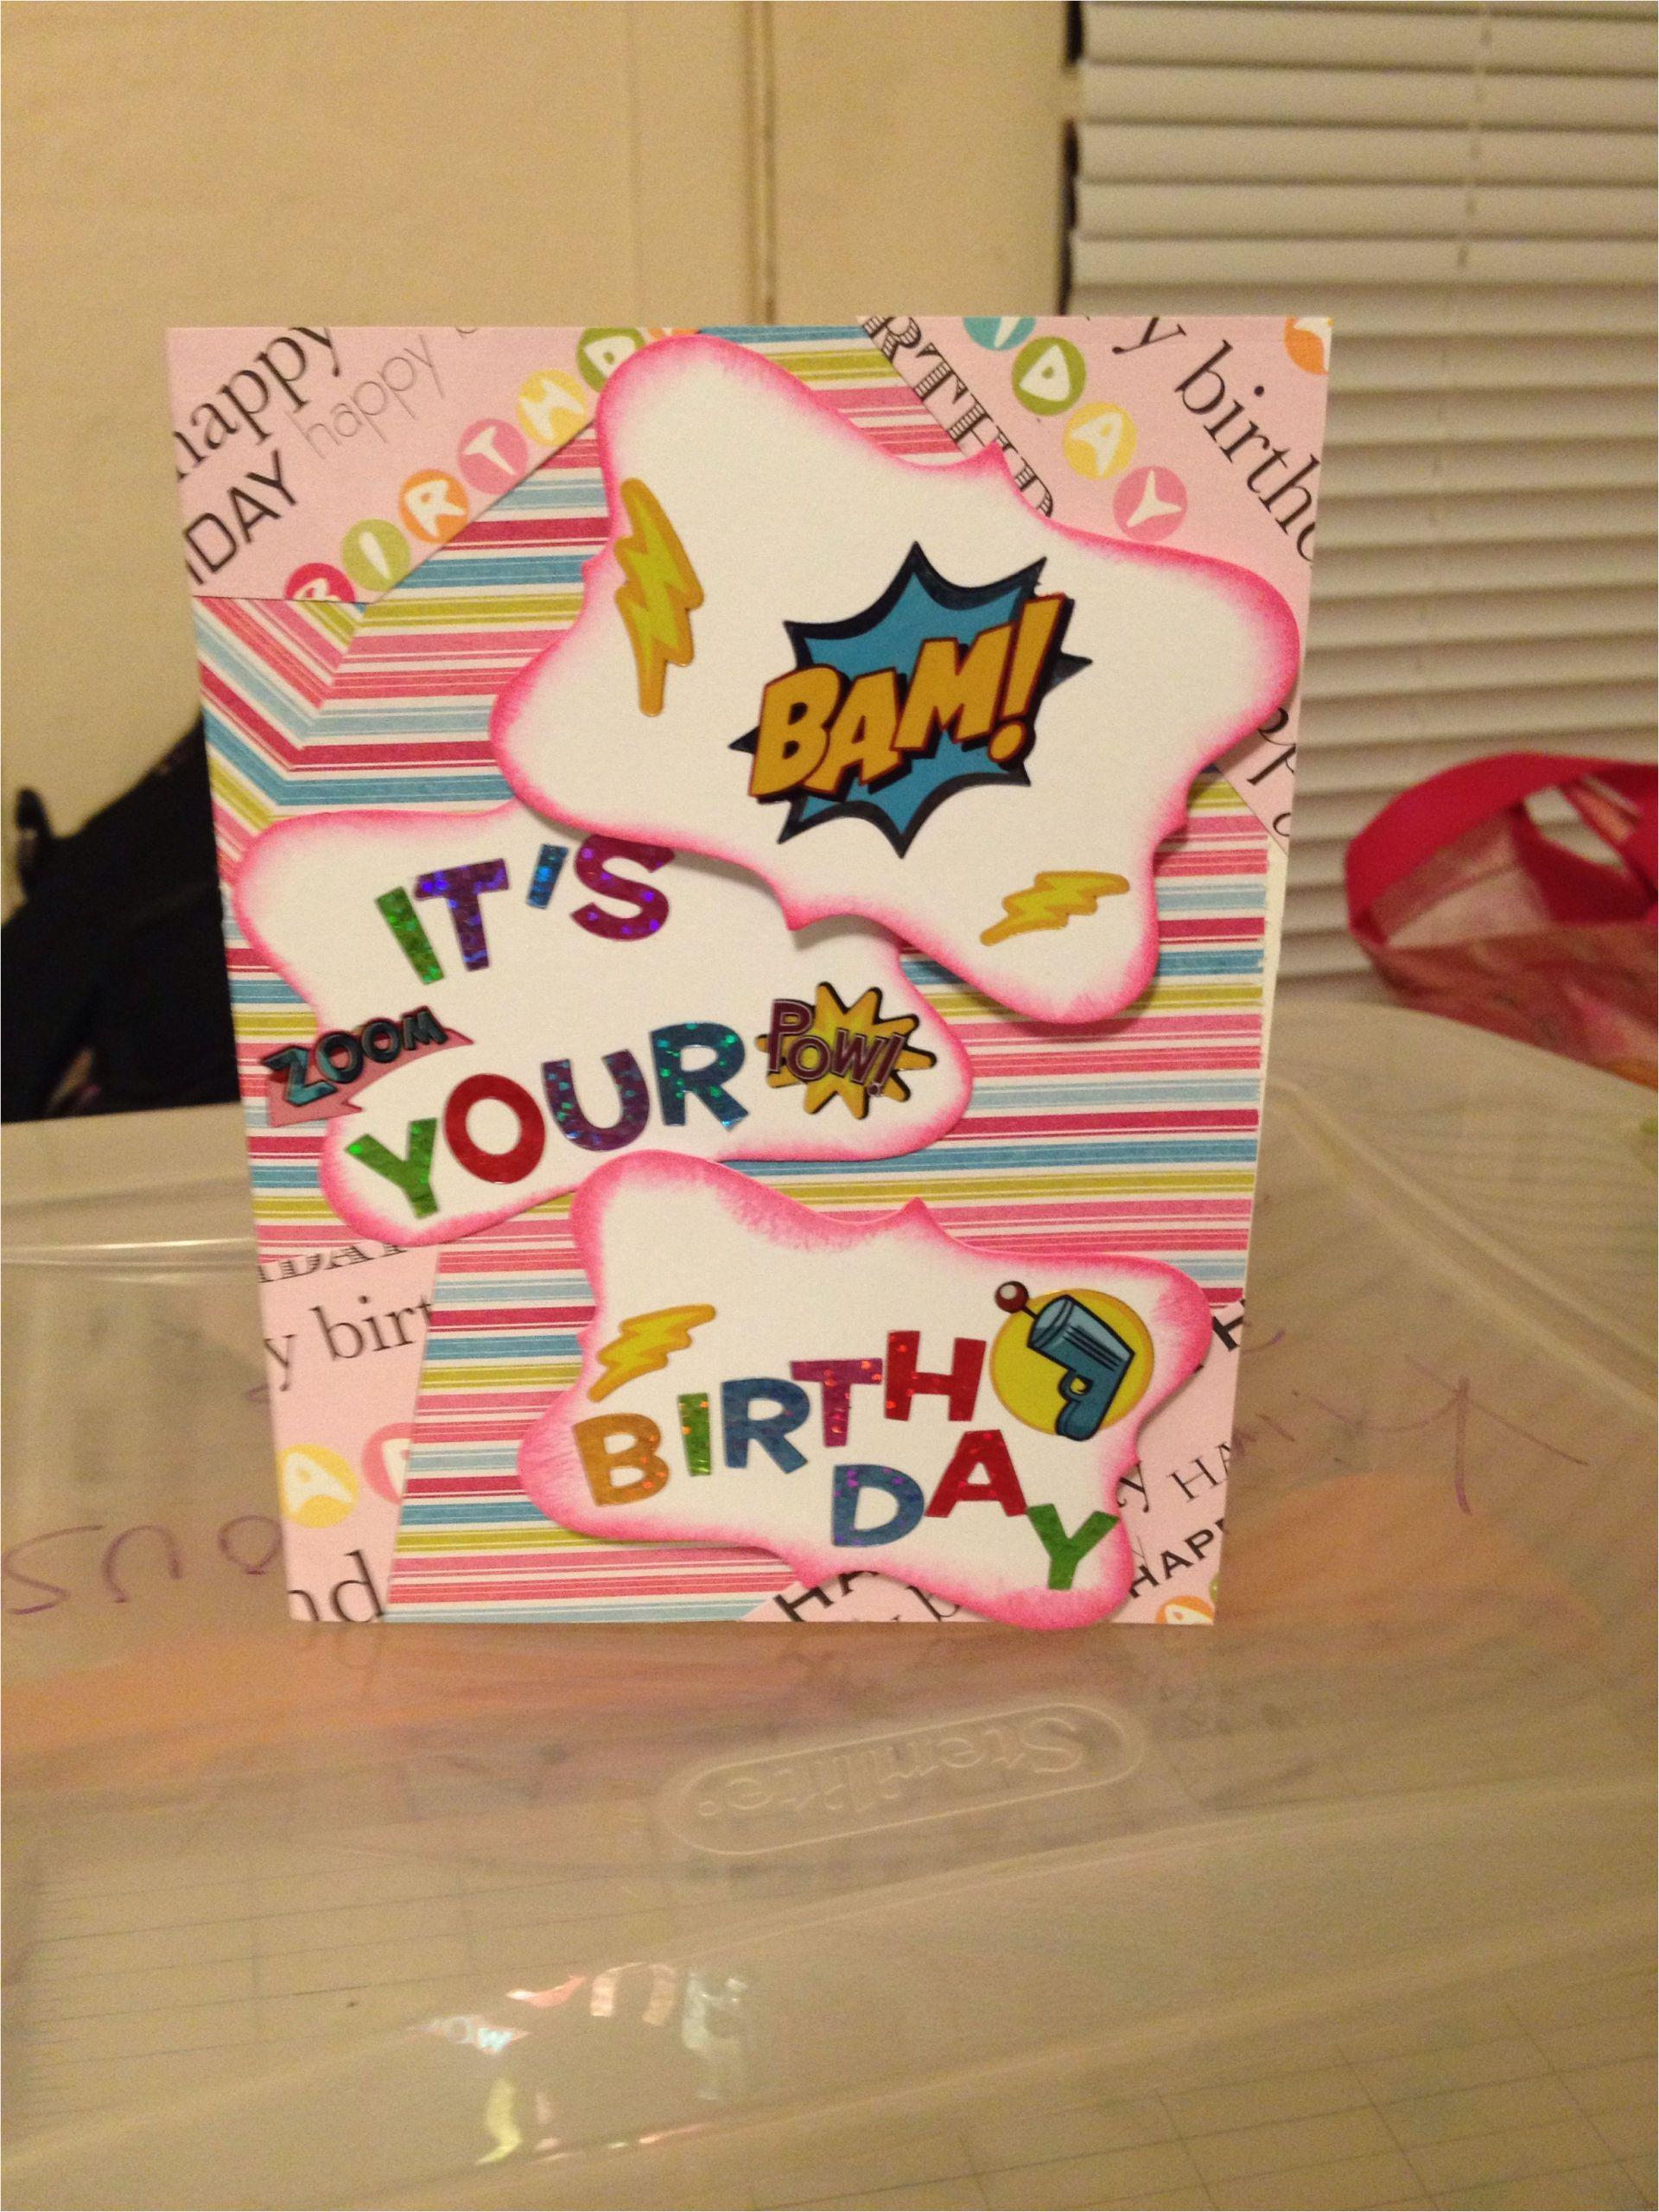 Happy Birthday Card Little Girl Birthday Card for 10 Year Old Girl 70th Birthday Card